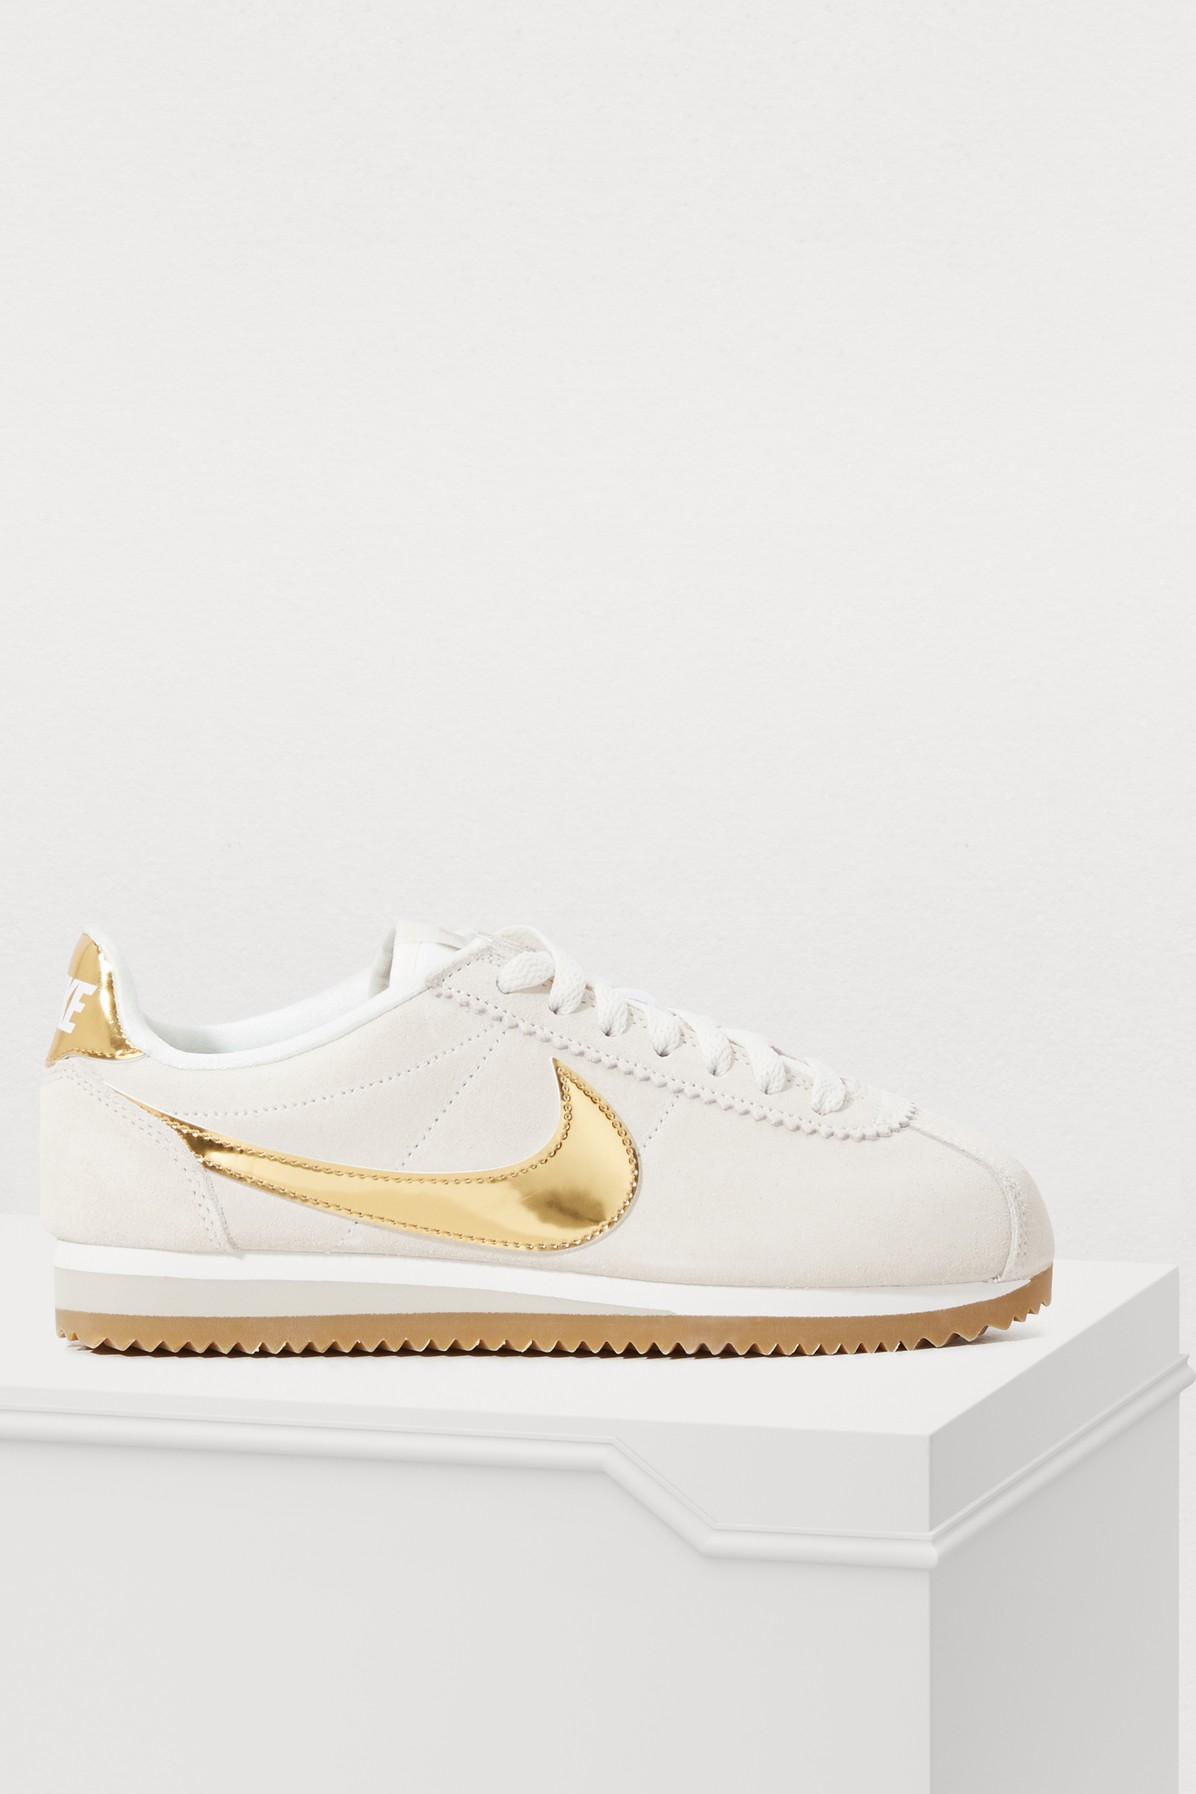 Nike Wmns Classic Cortez SE Casual Womens Shoes Sneakers Phantom 902856-013